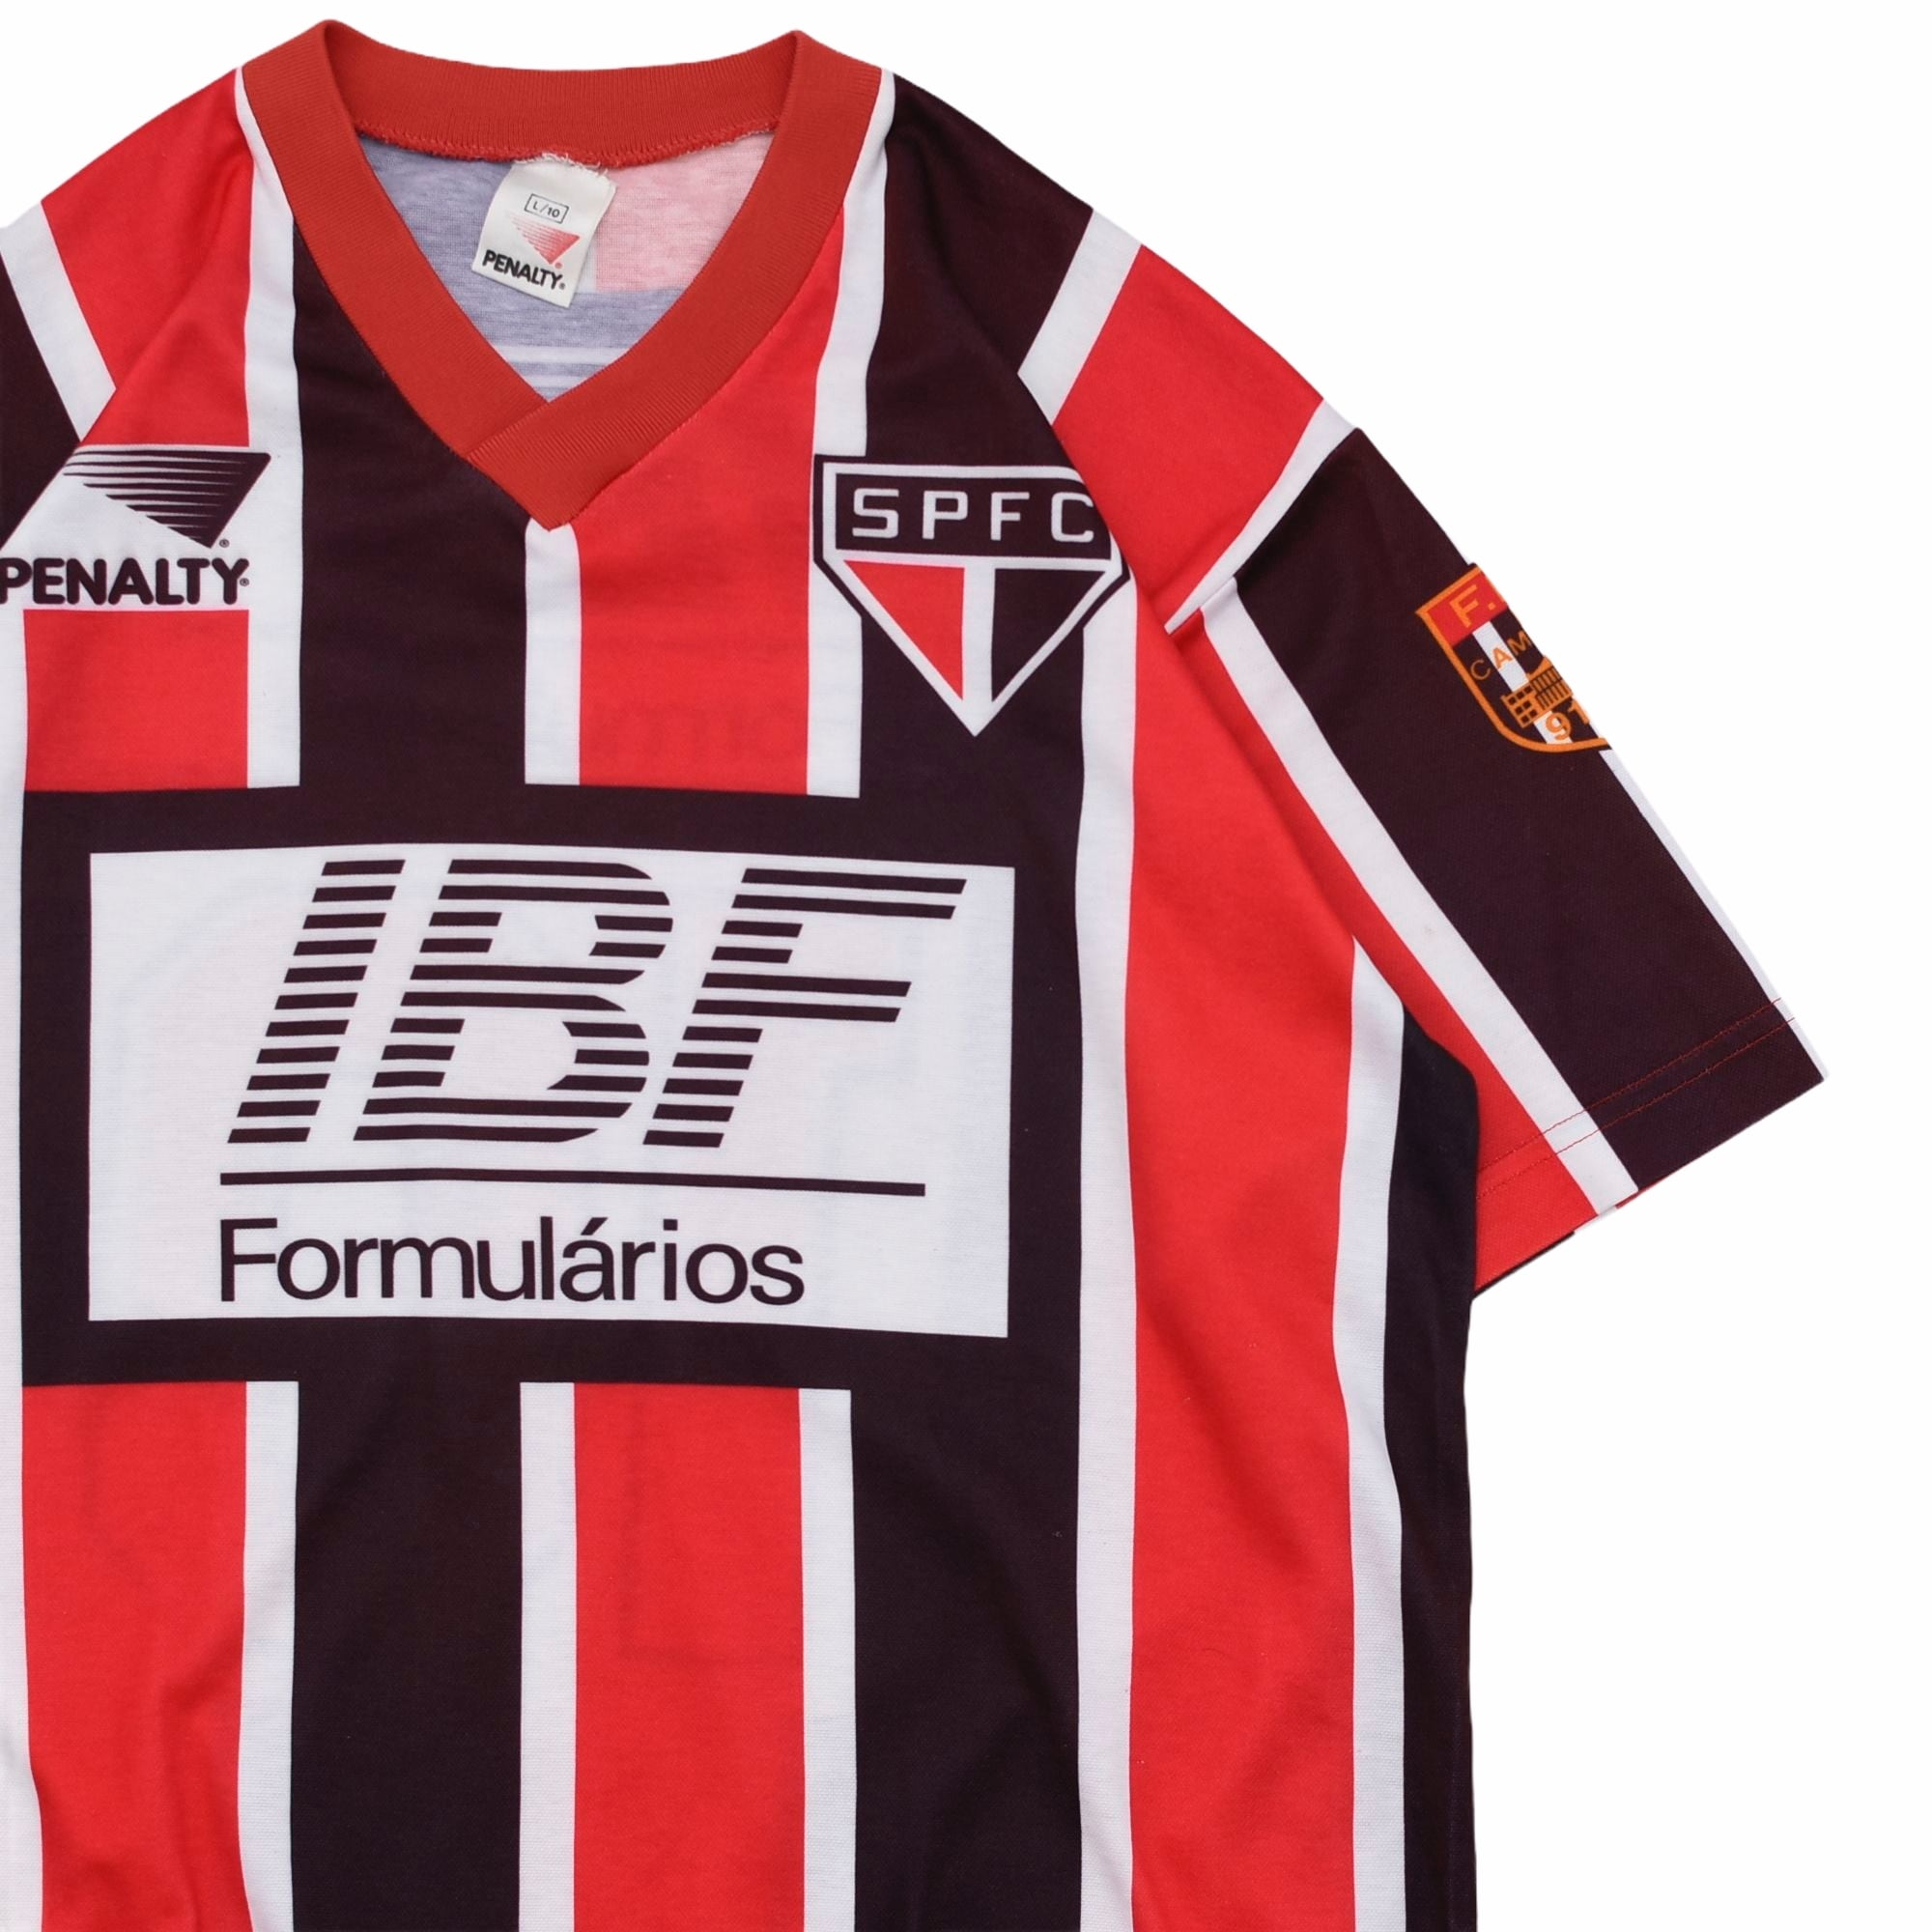 "91-92 PENALTY ""SPFC""Sao Paulo FC jersey"